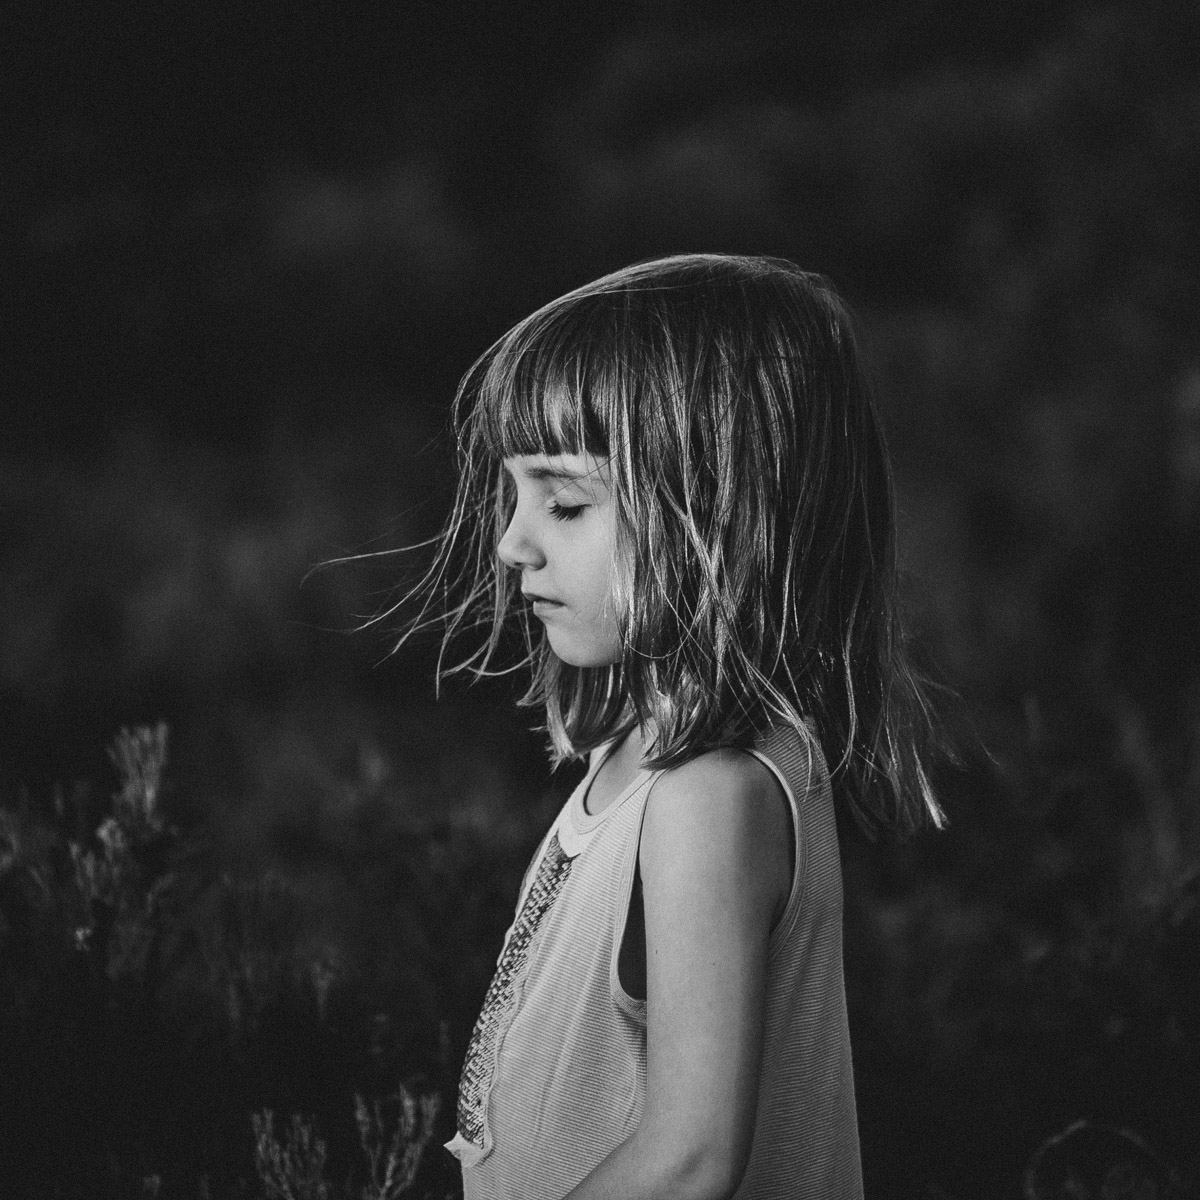 portraits-145.jpg